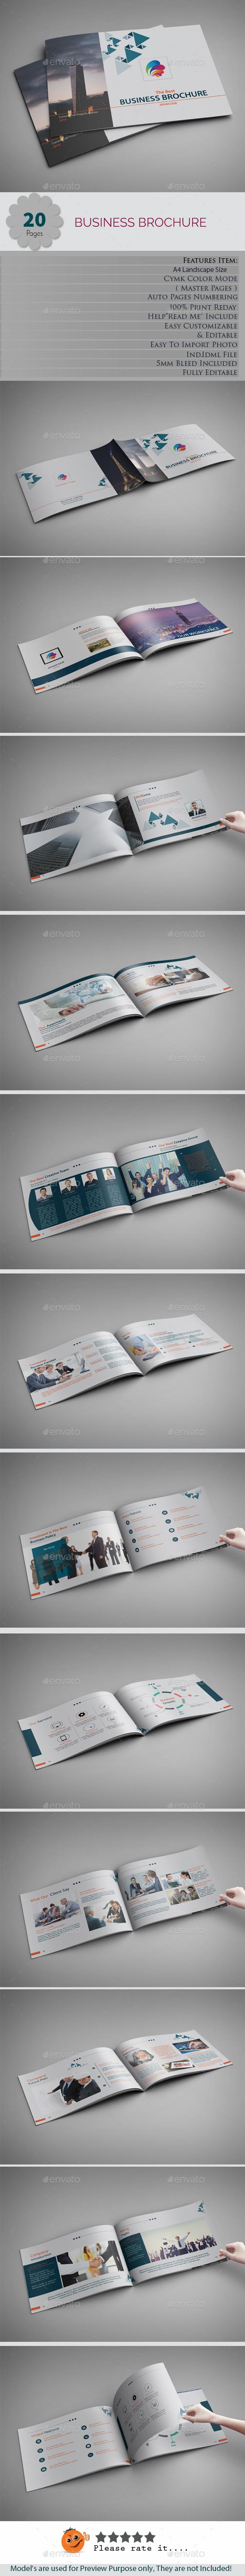 Landscape Brochures - Brochures Print Templates